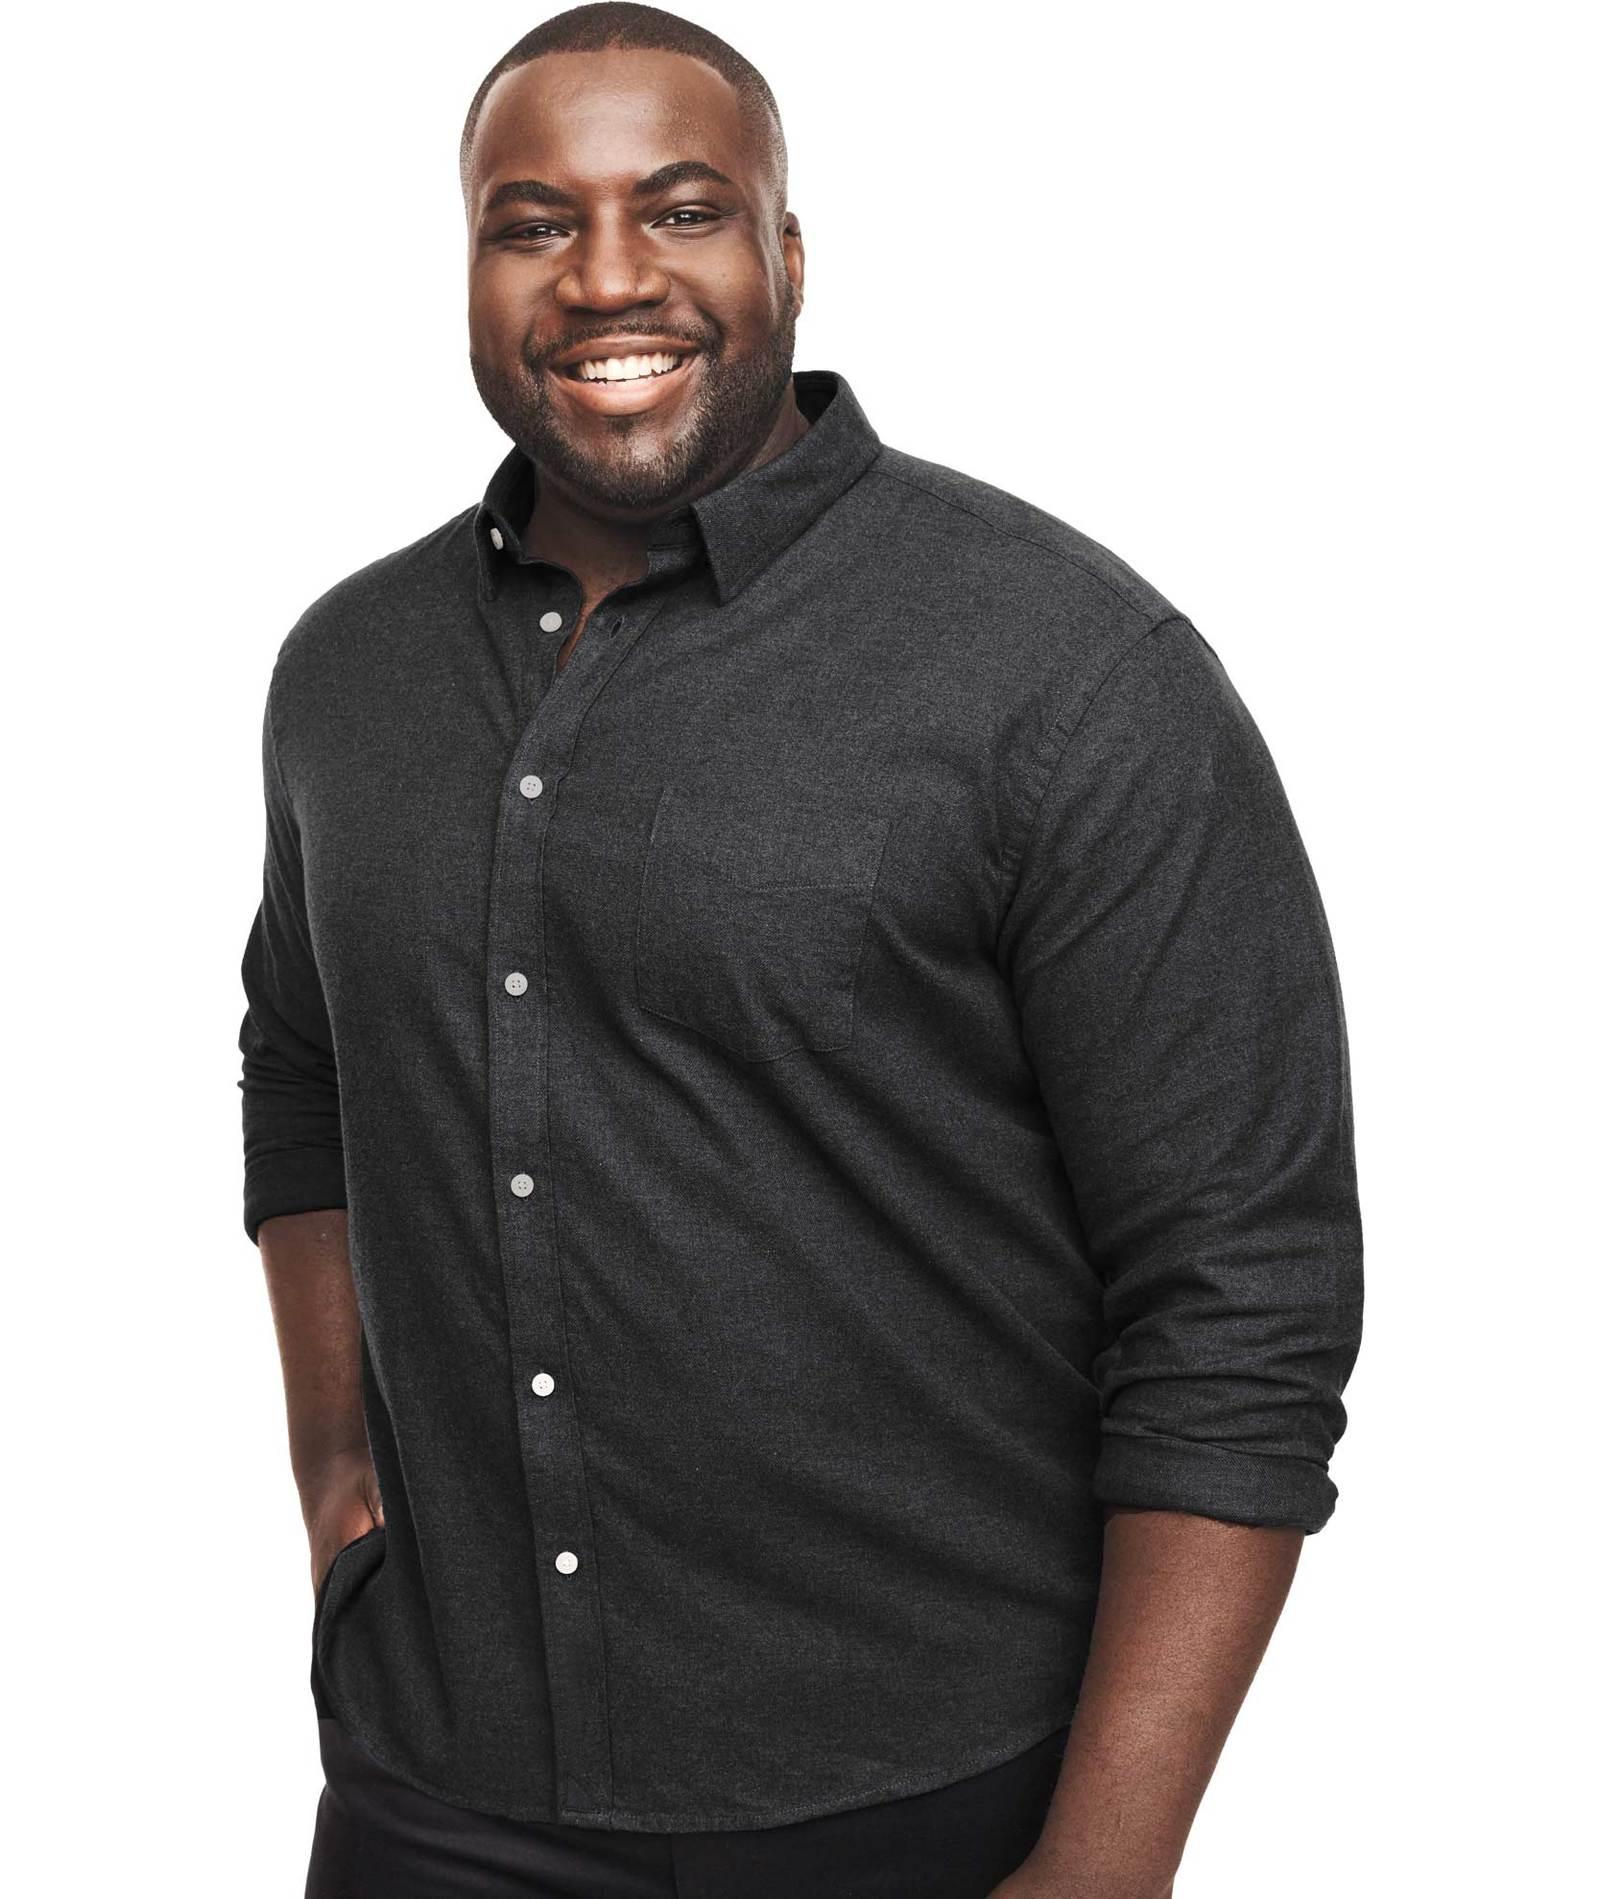 UNTUCKit Flannel Sherwood Shirt - Black